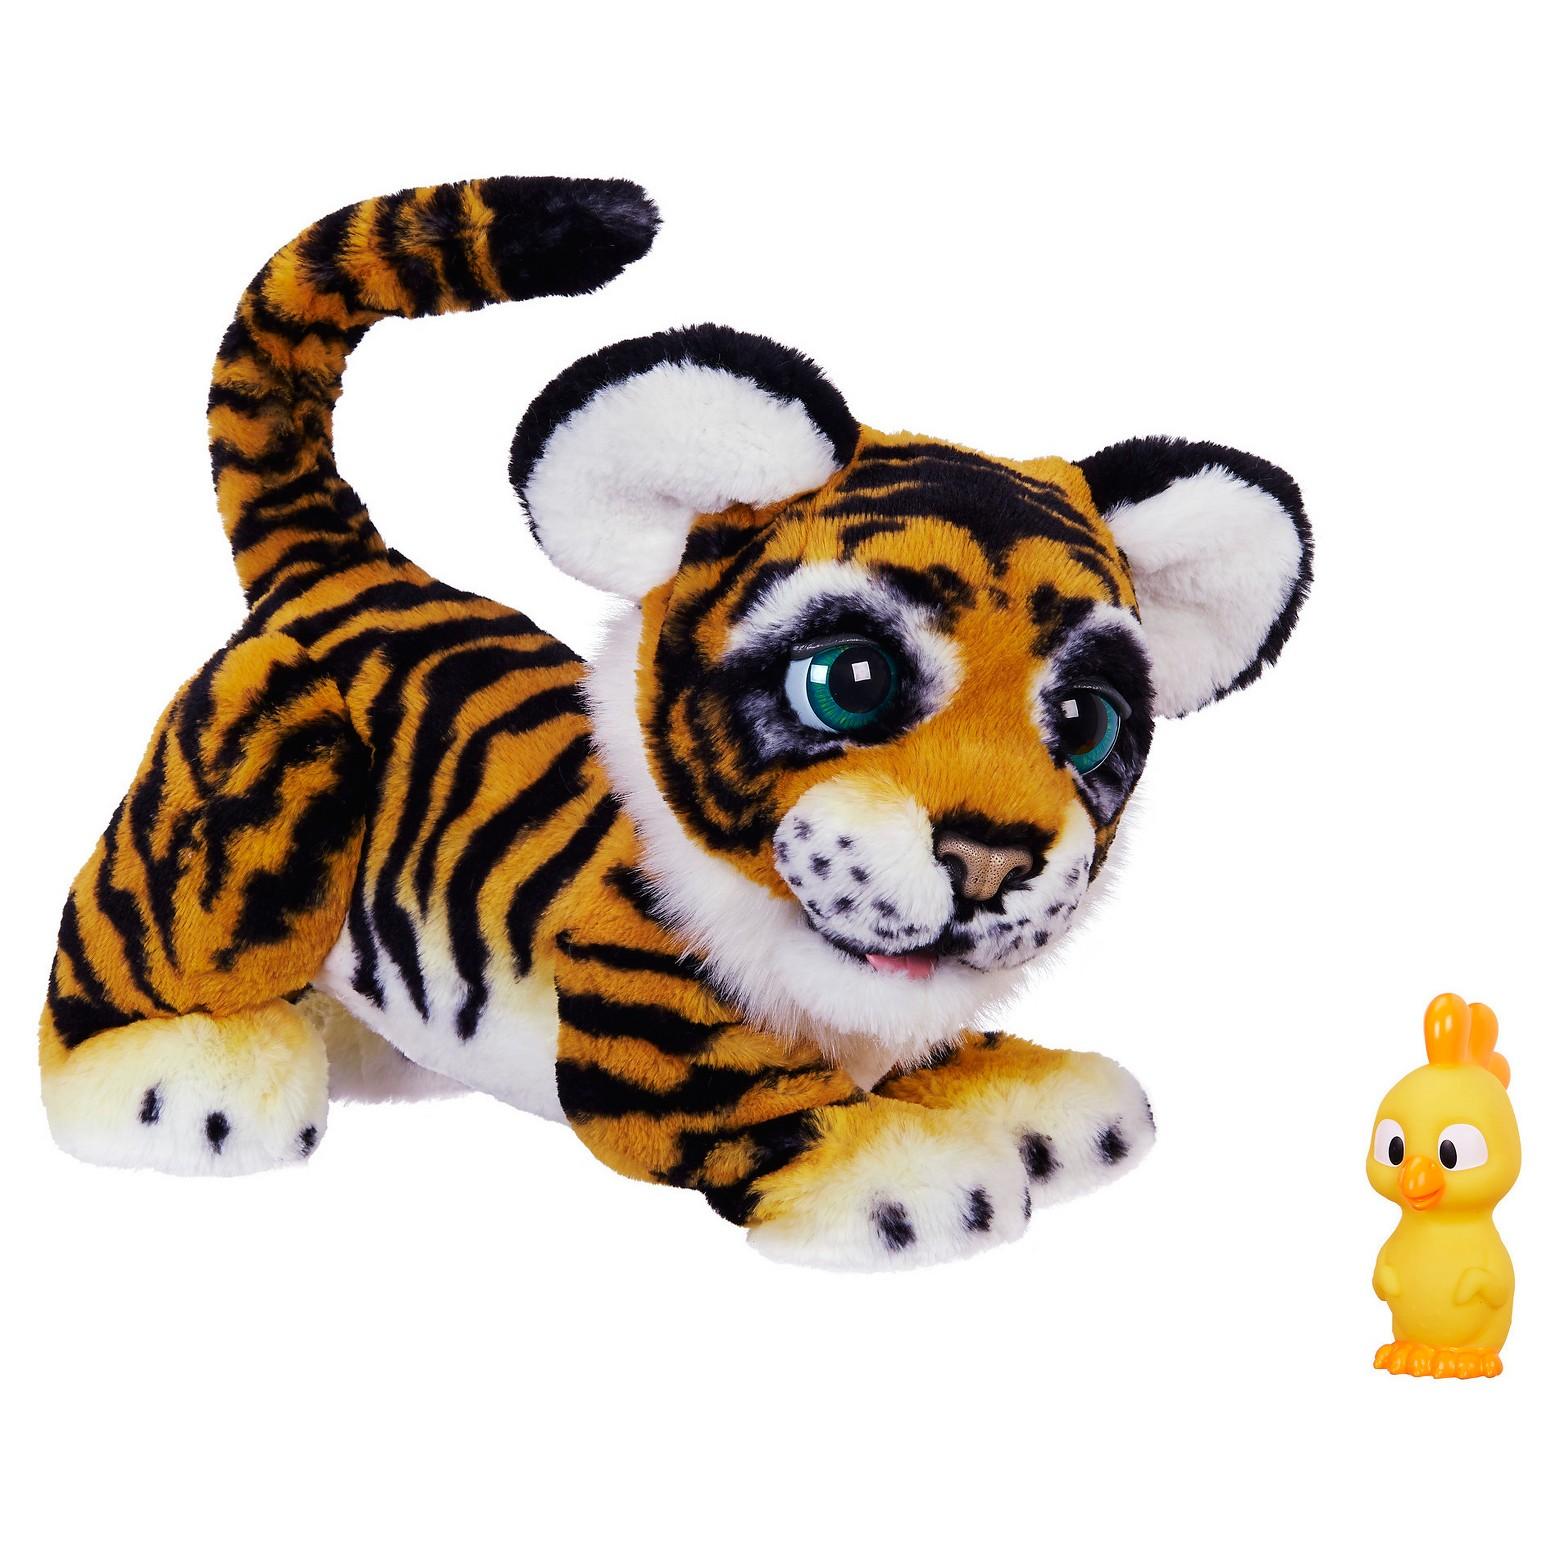 furReal Roarin' Tyler - the playful Tiger $81.99